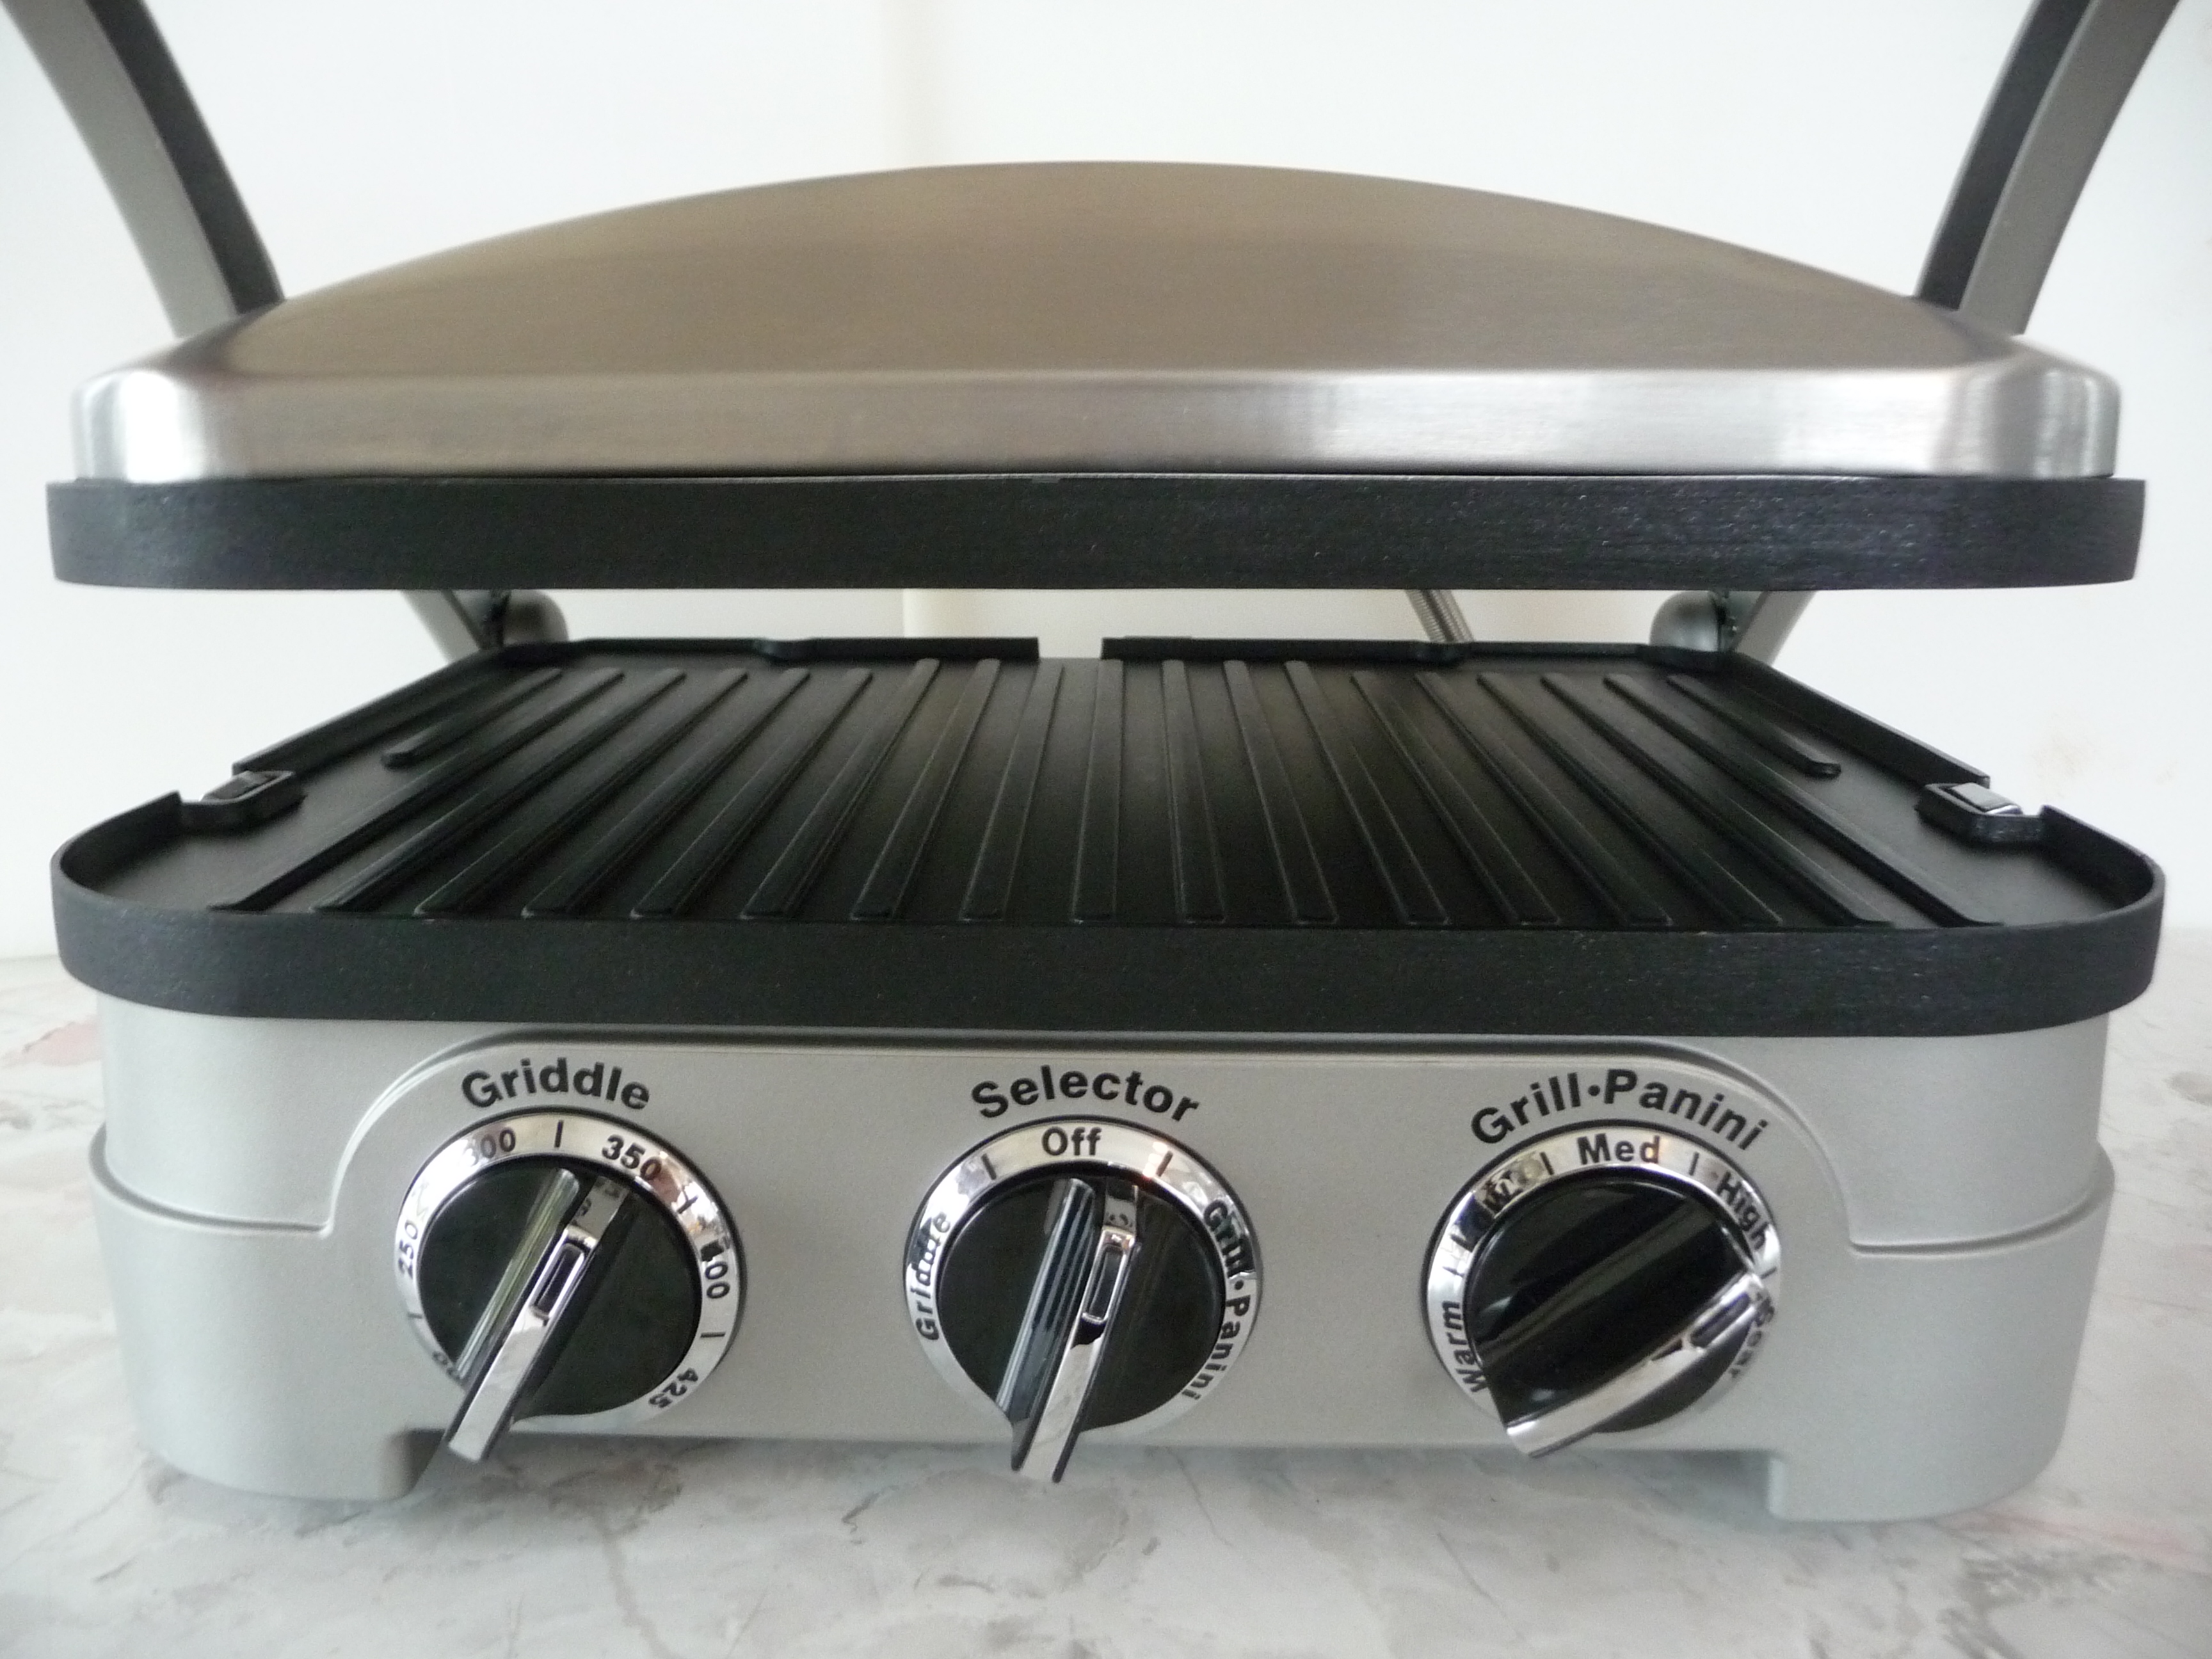 Toaster Oven Or Panini Press Paninipress Toasteroven